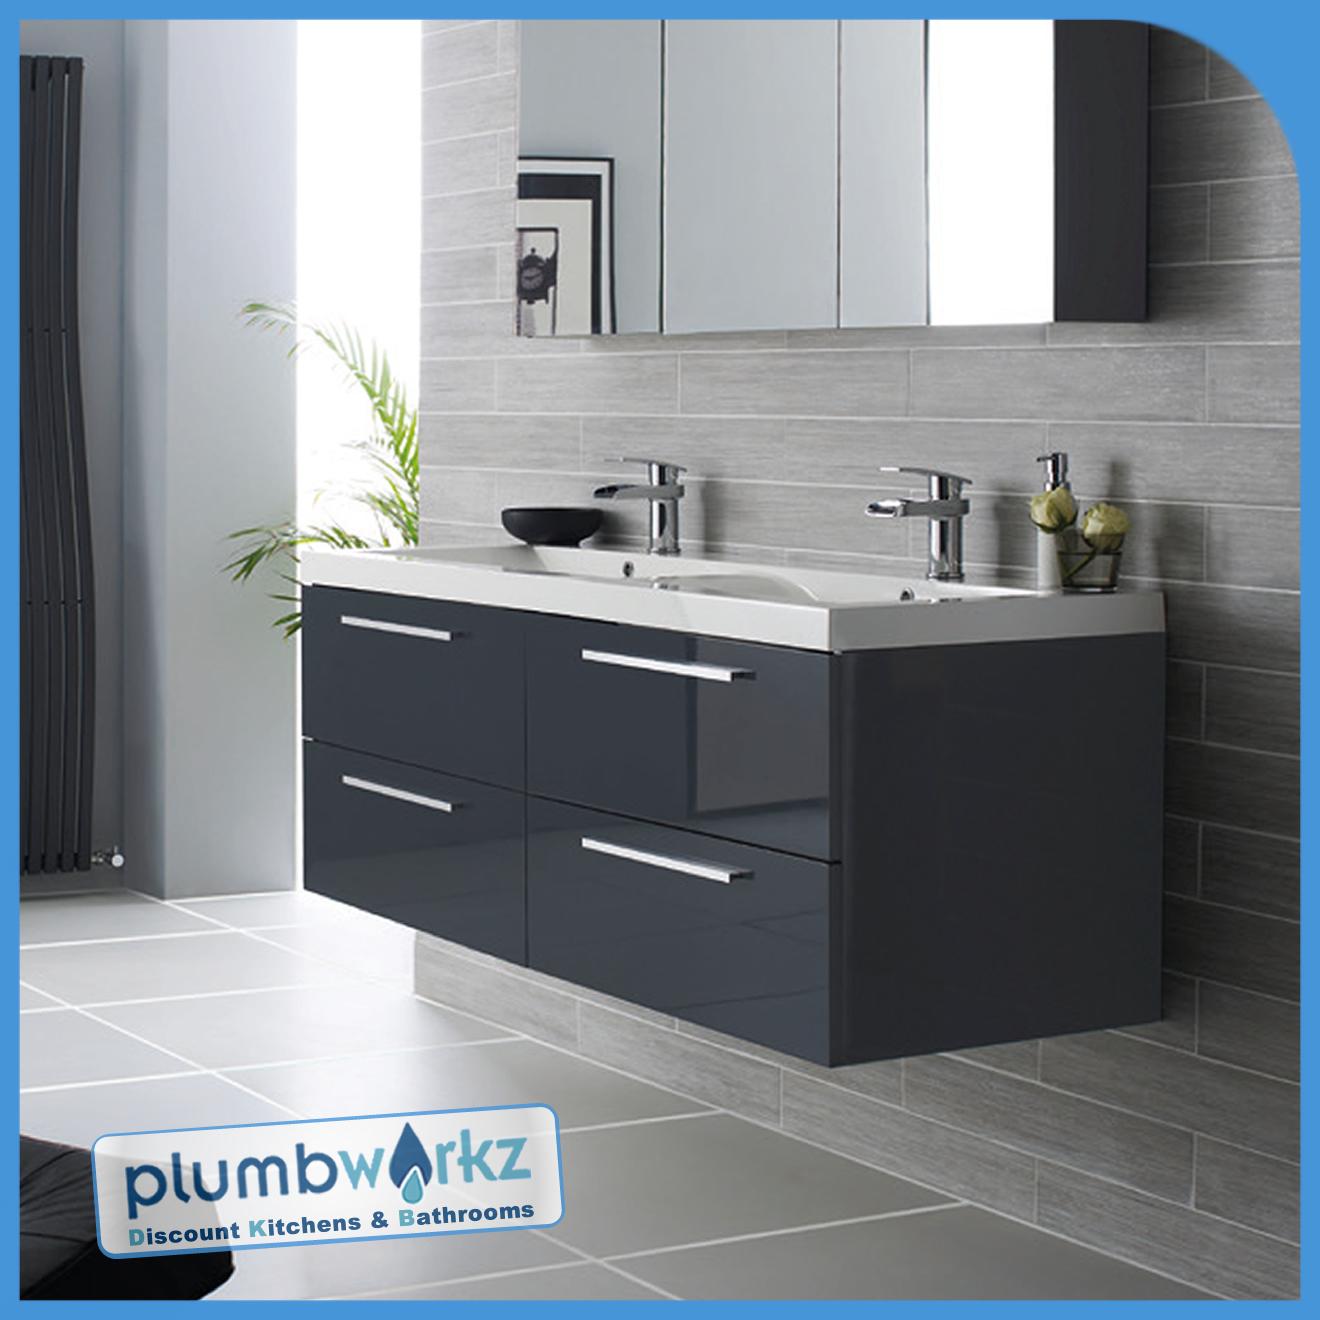 Details about gloss graphite double basin bathroom vanity unit sink storage modern furniture